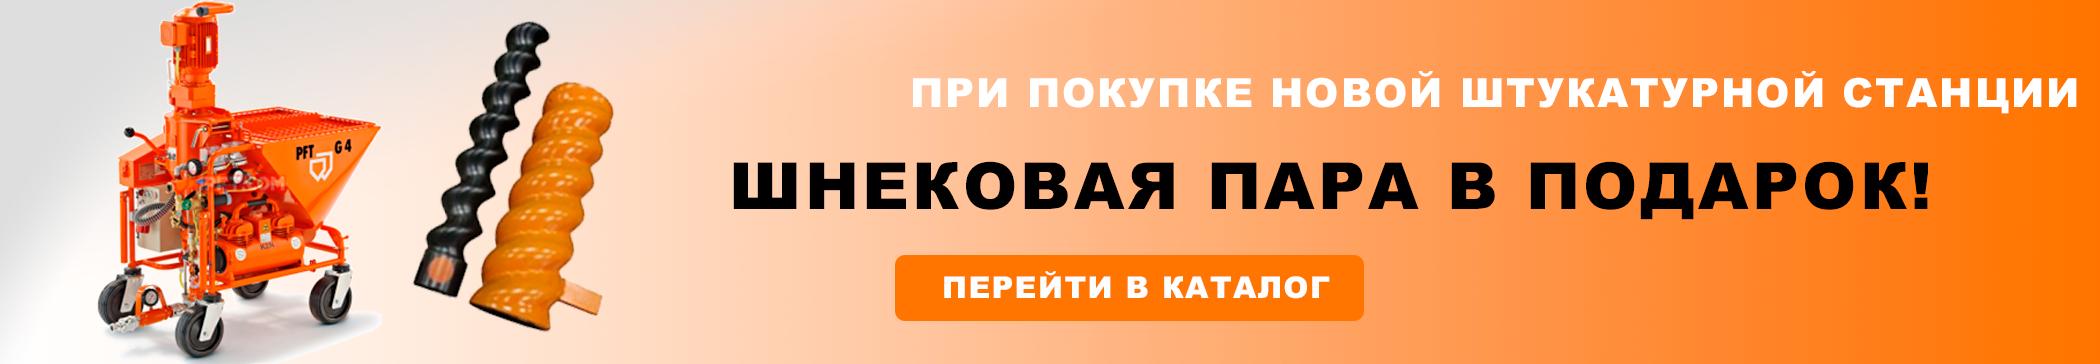 https://st-perm.ru/image/catalog/sales/sales_1.png